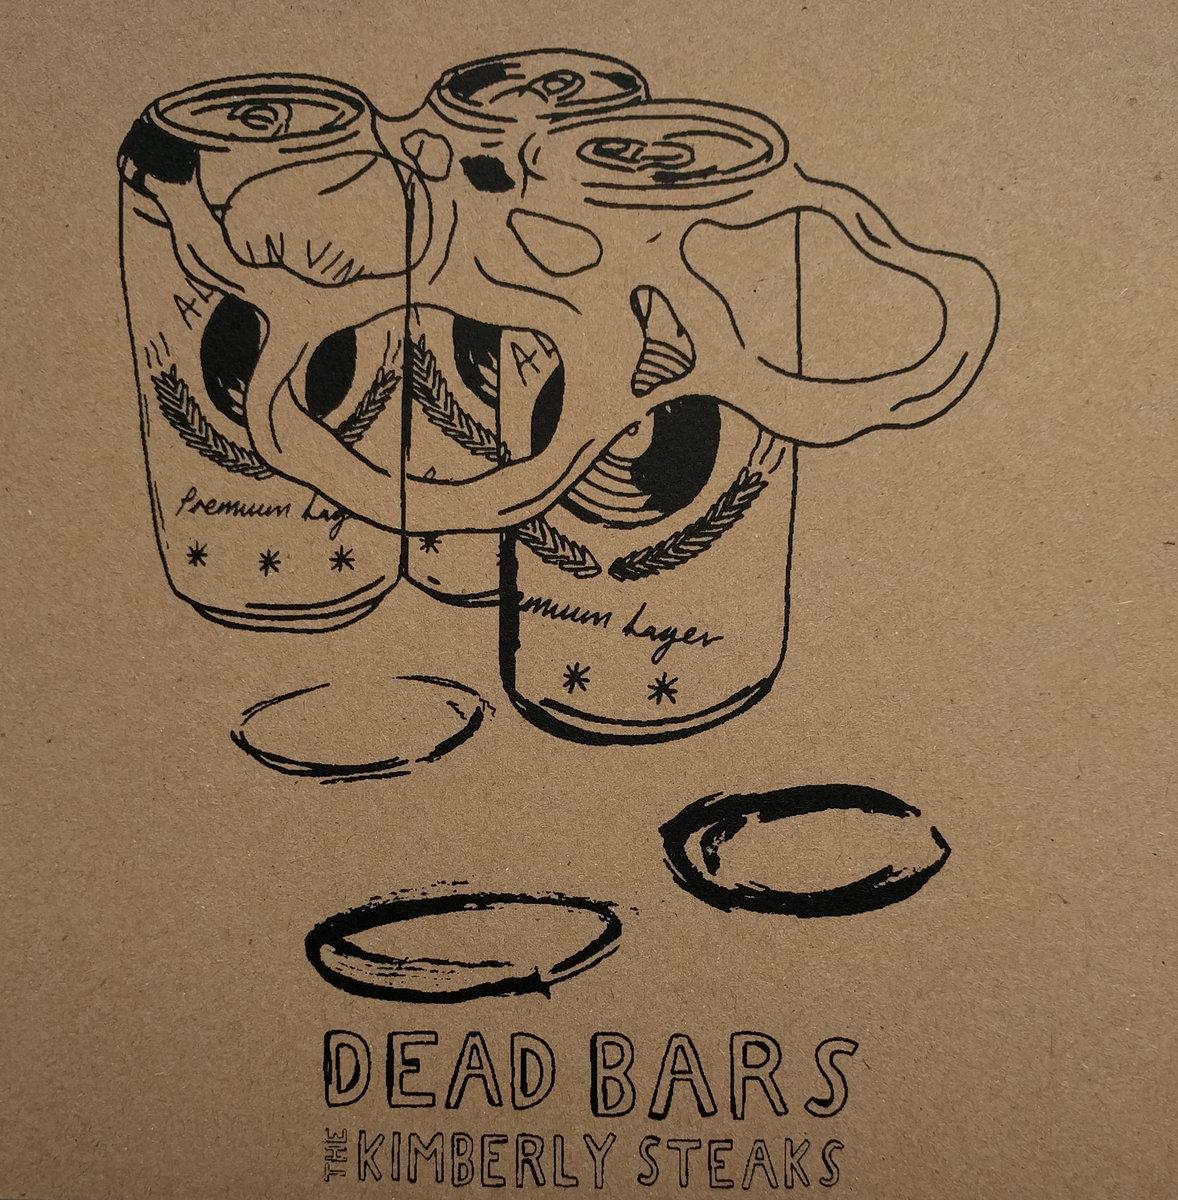 Dead Bars / The Kimberly Steaks - Split 7